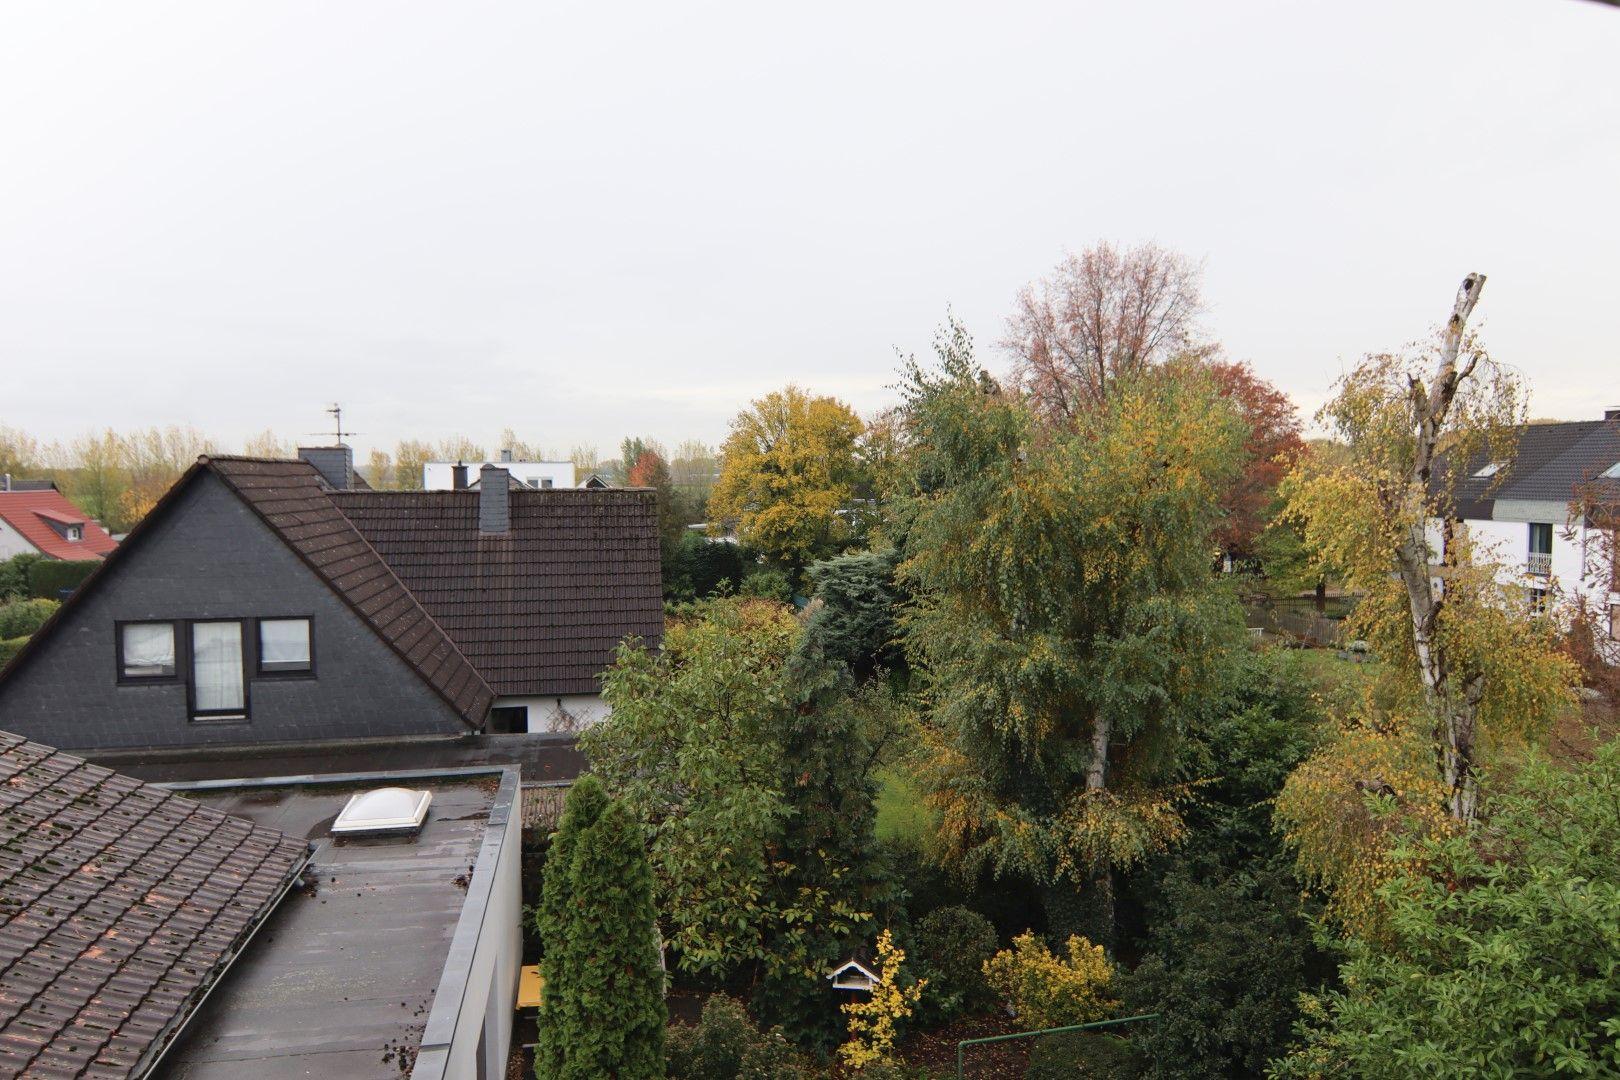 Immobilie Nr.0276 | Gonellastraße 86, 40668 Meerbusch